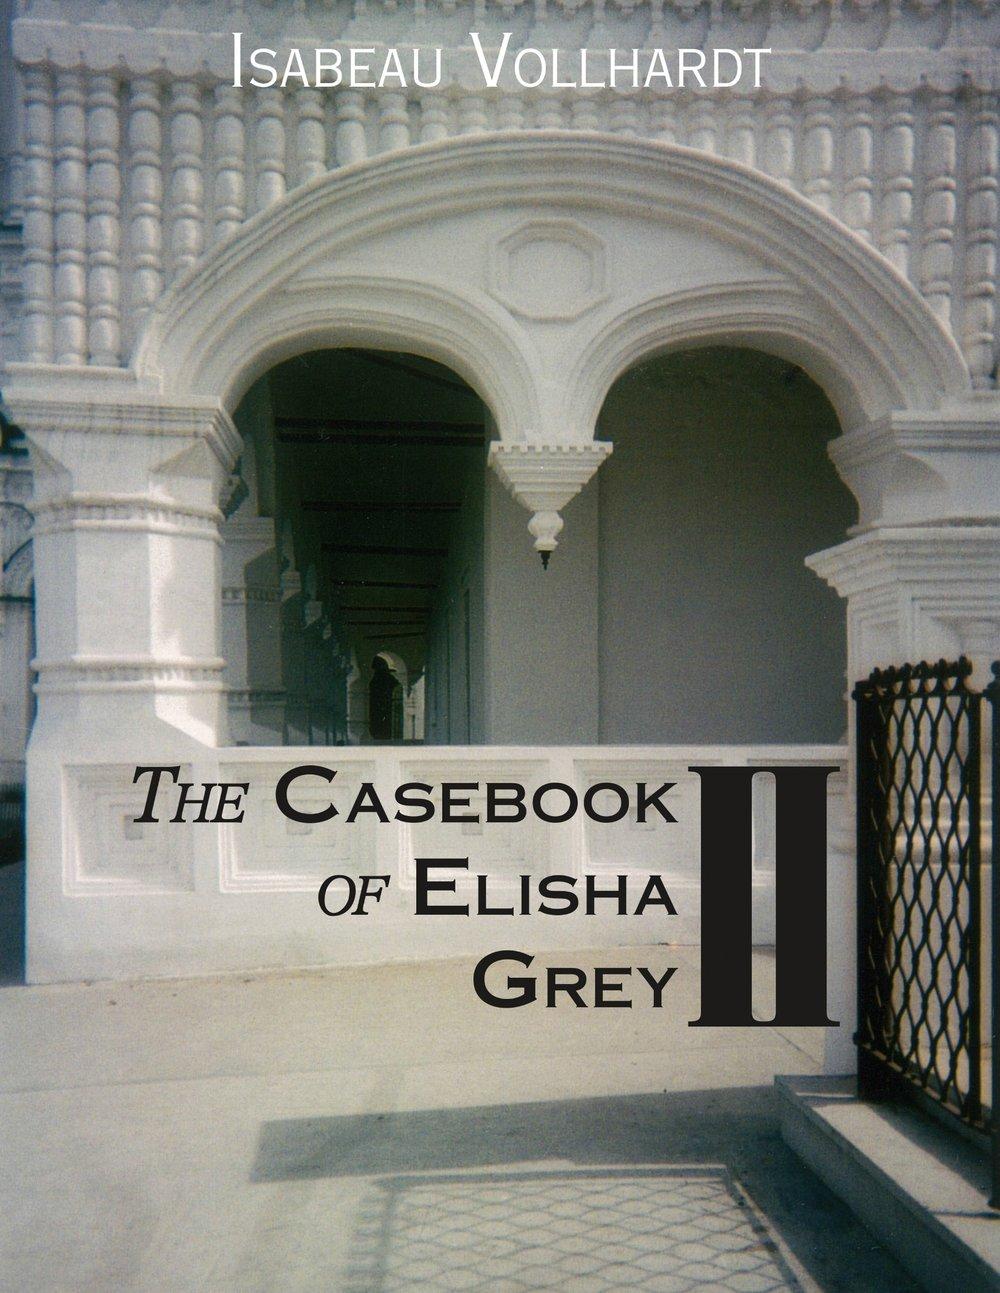 elisha grey 2 cover rev.jpeg